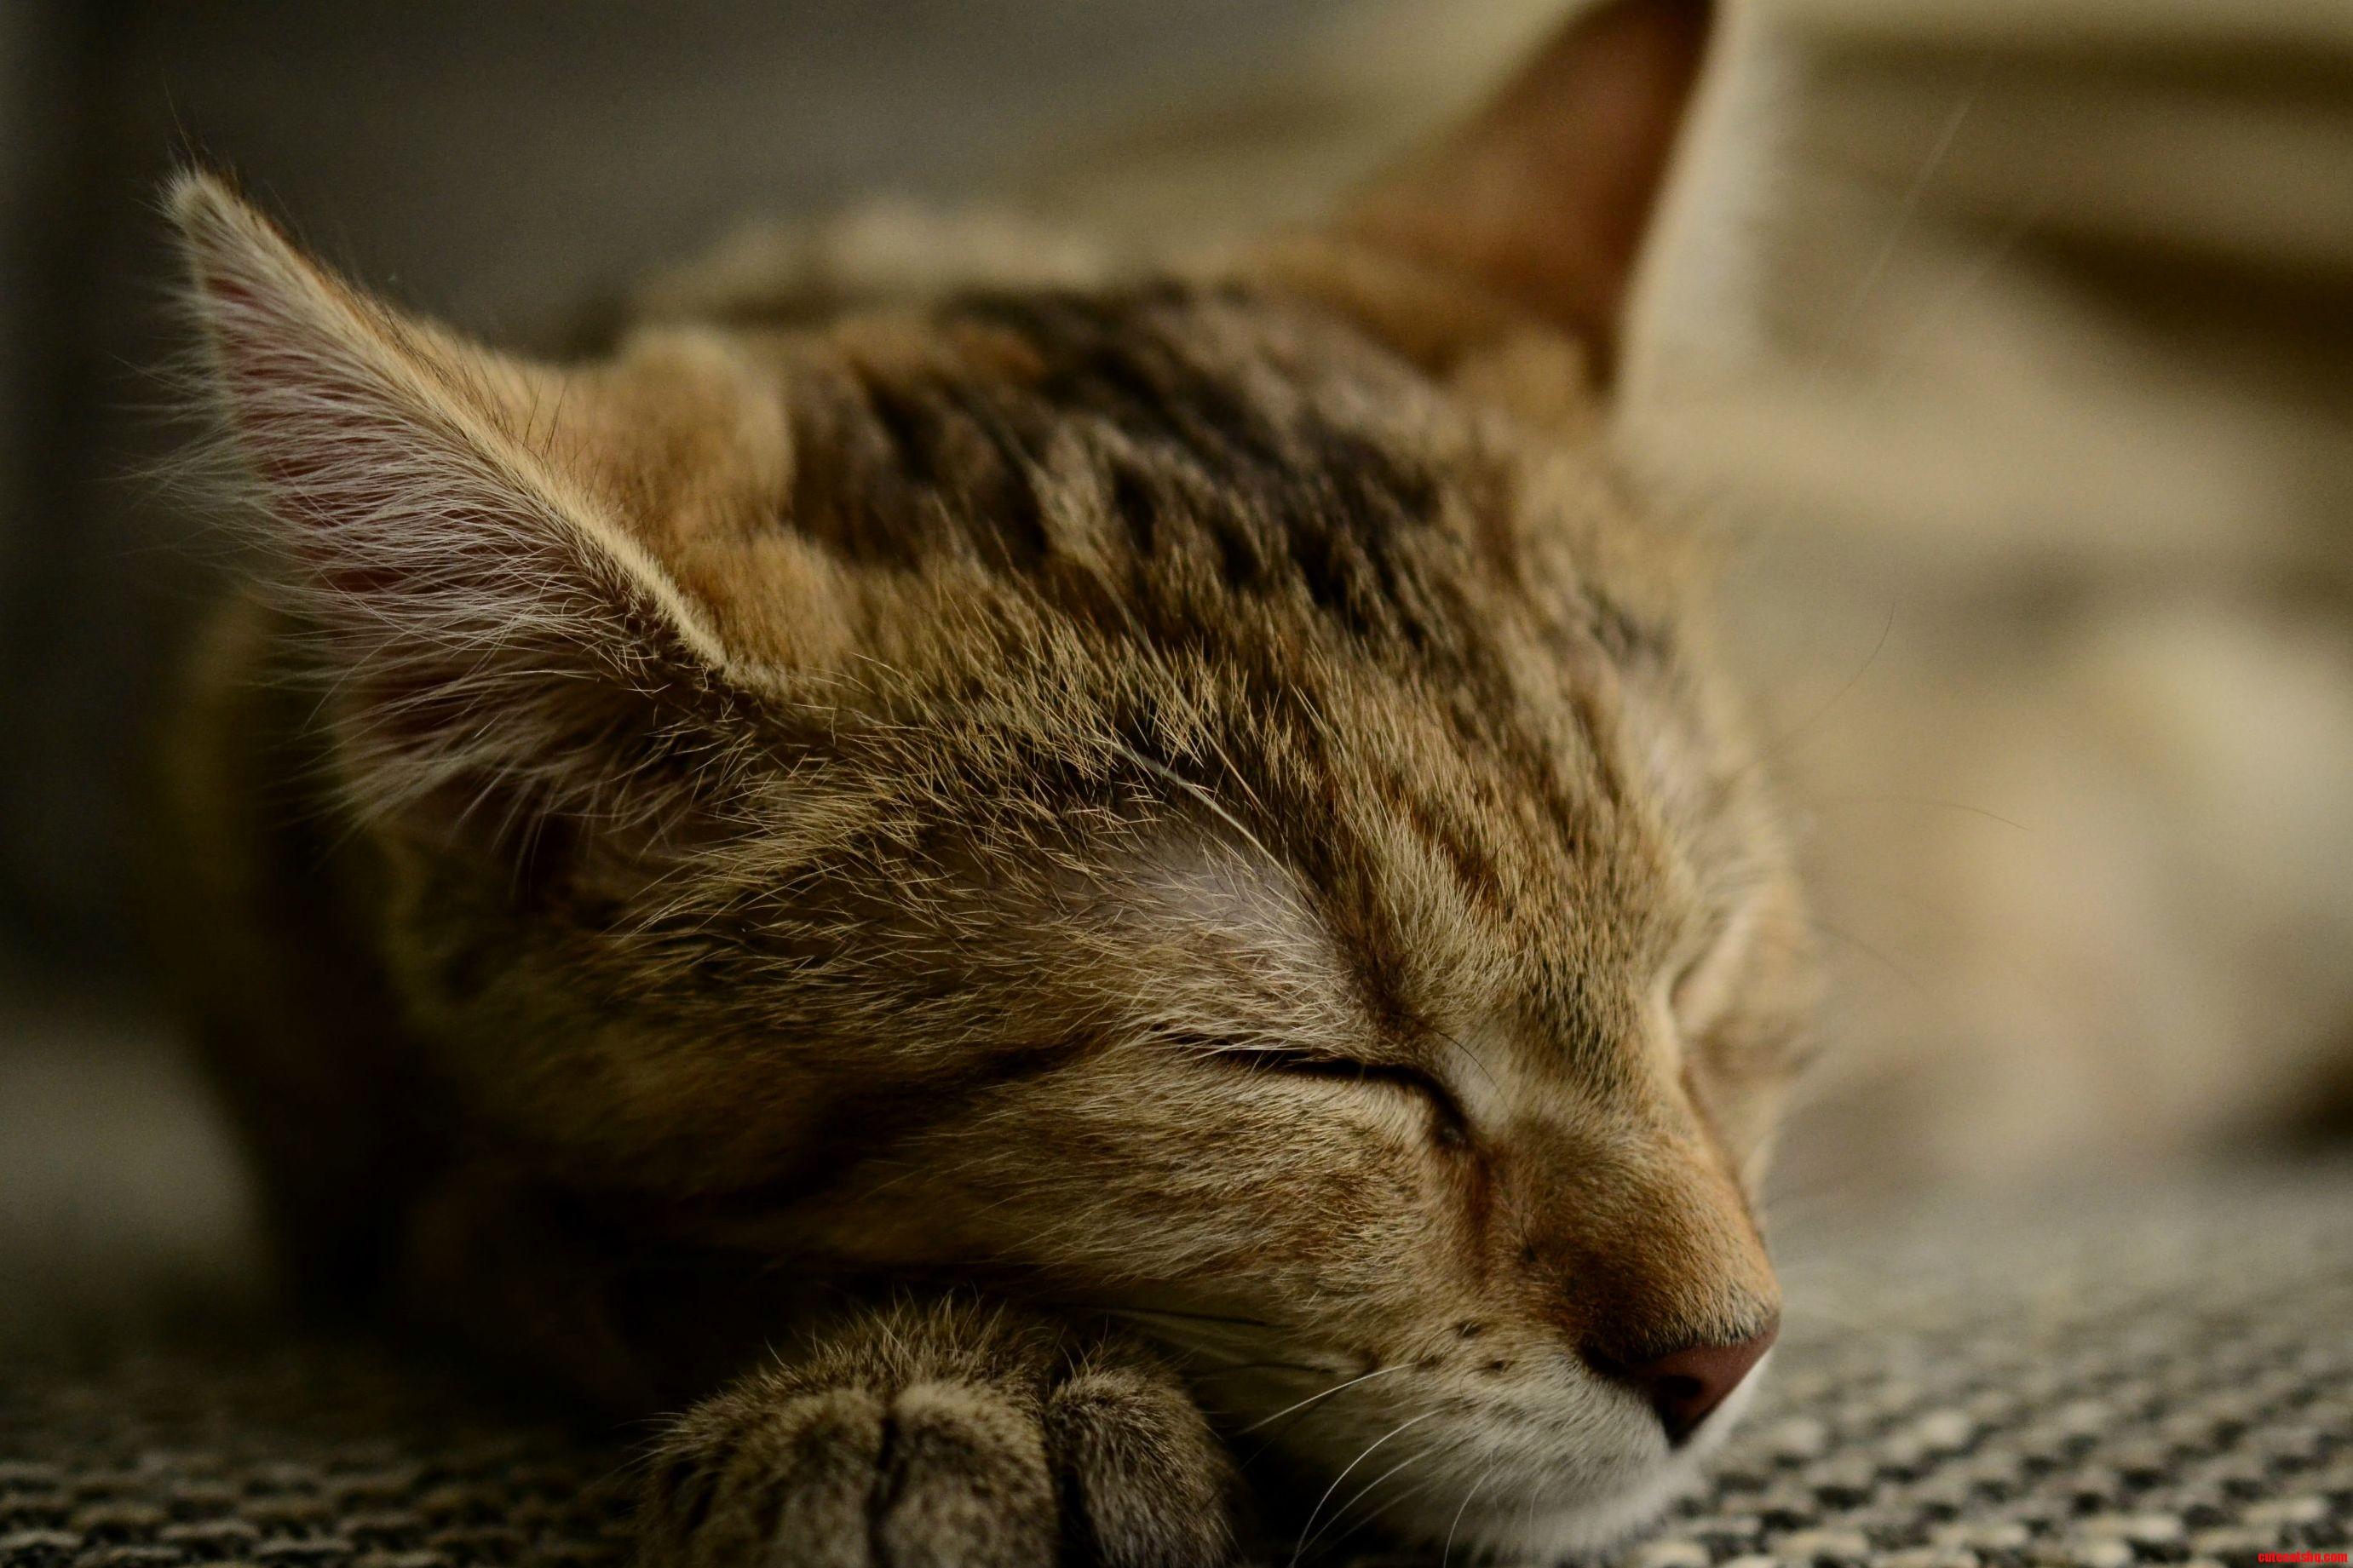 Charlie having a nap oc